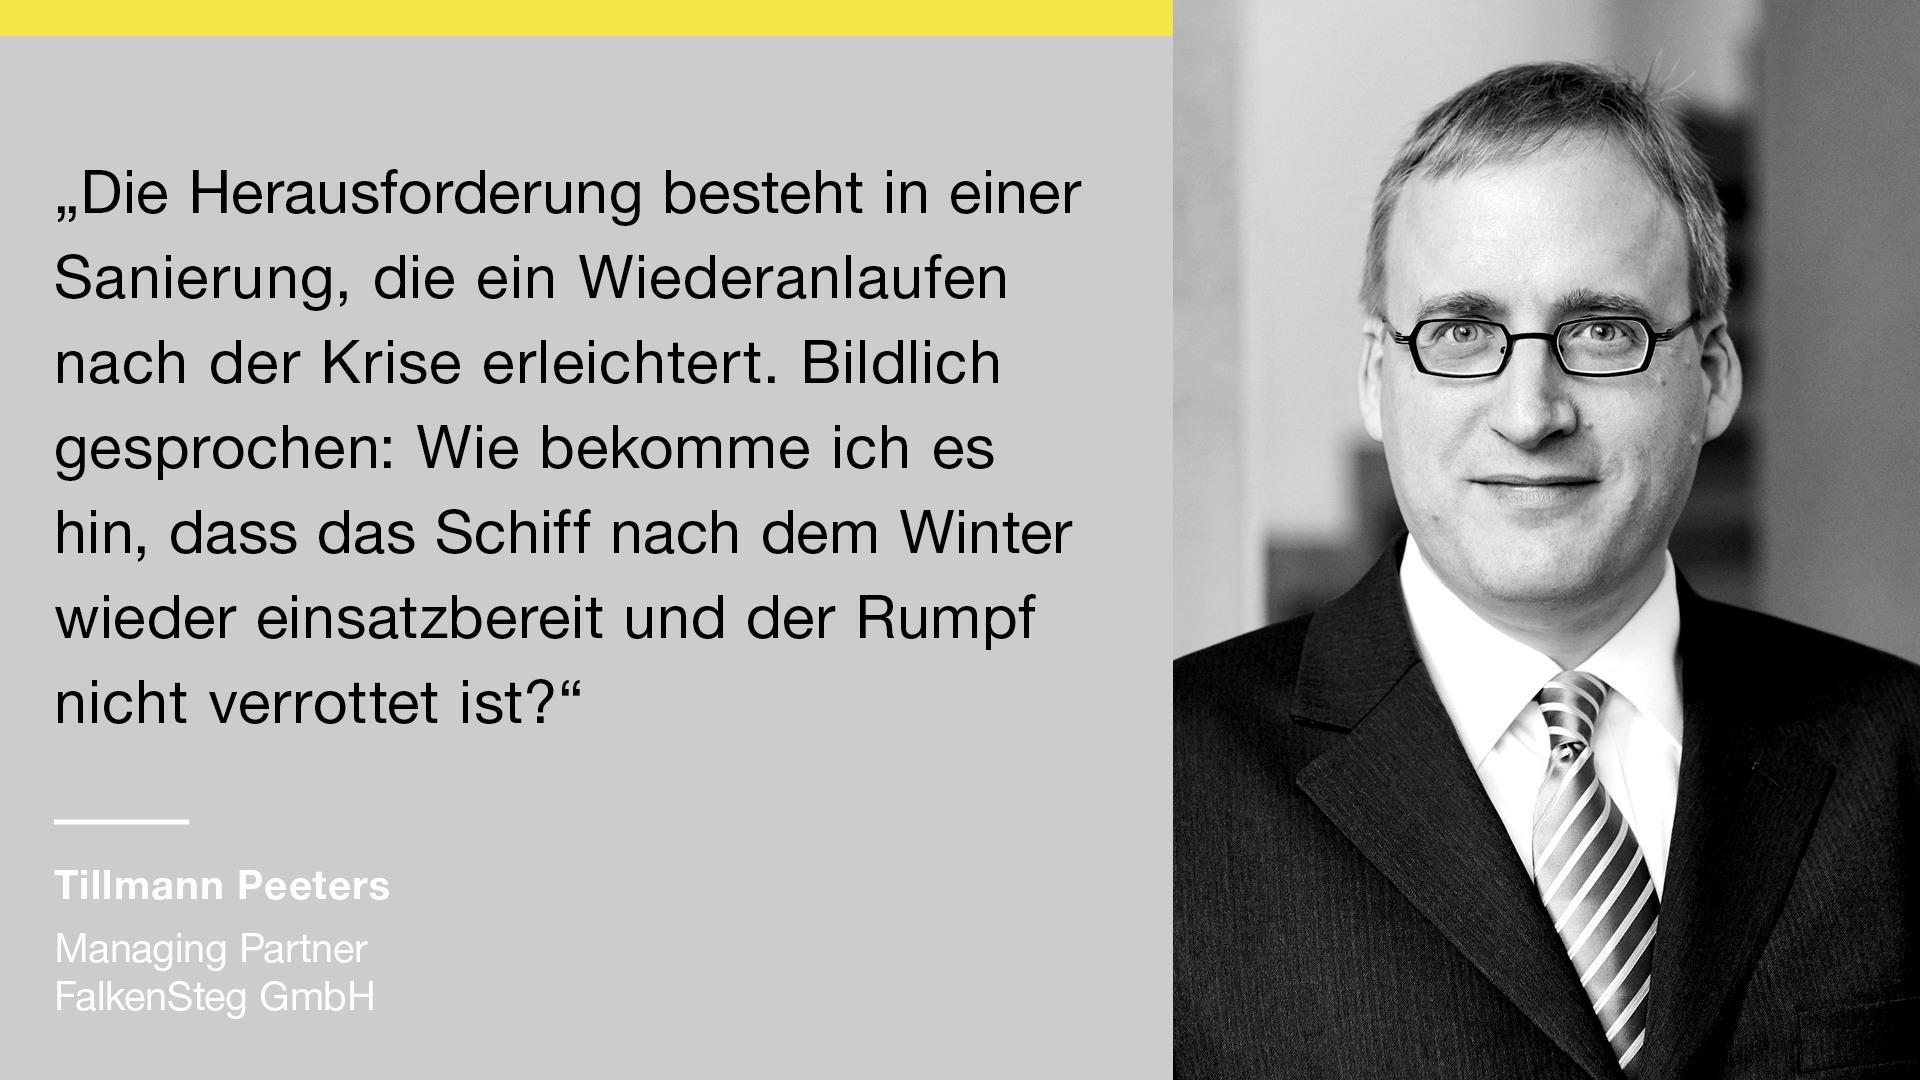 Falkensteg-Starug-Saninsfog-Restrukturierung-Sanierungskonzept-duesseldorf-Frankfurt- DAA_SoMe_3Fragen Tillmann Peeters